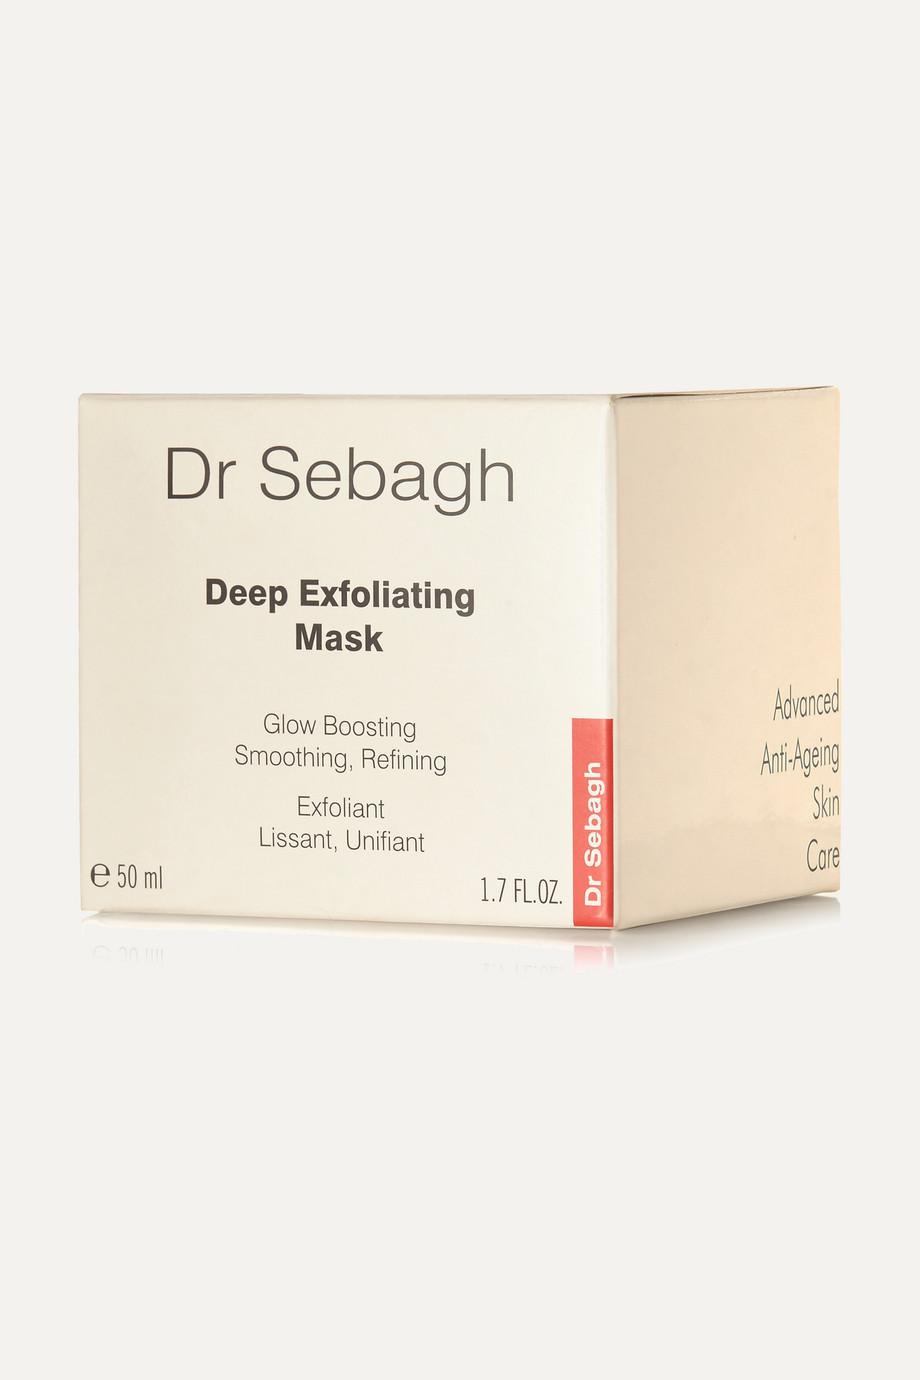 Dr Sebagh Deep Exfoliating Mask, 50ml